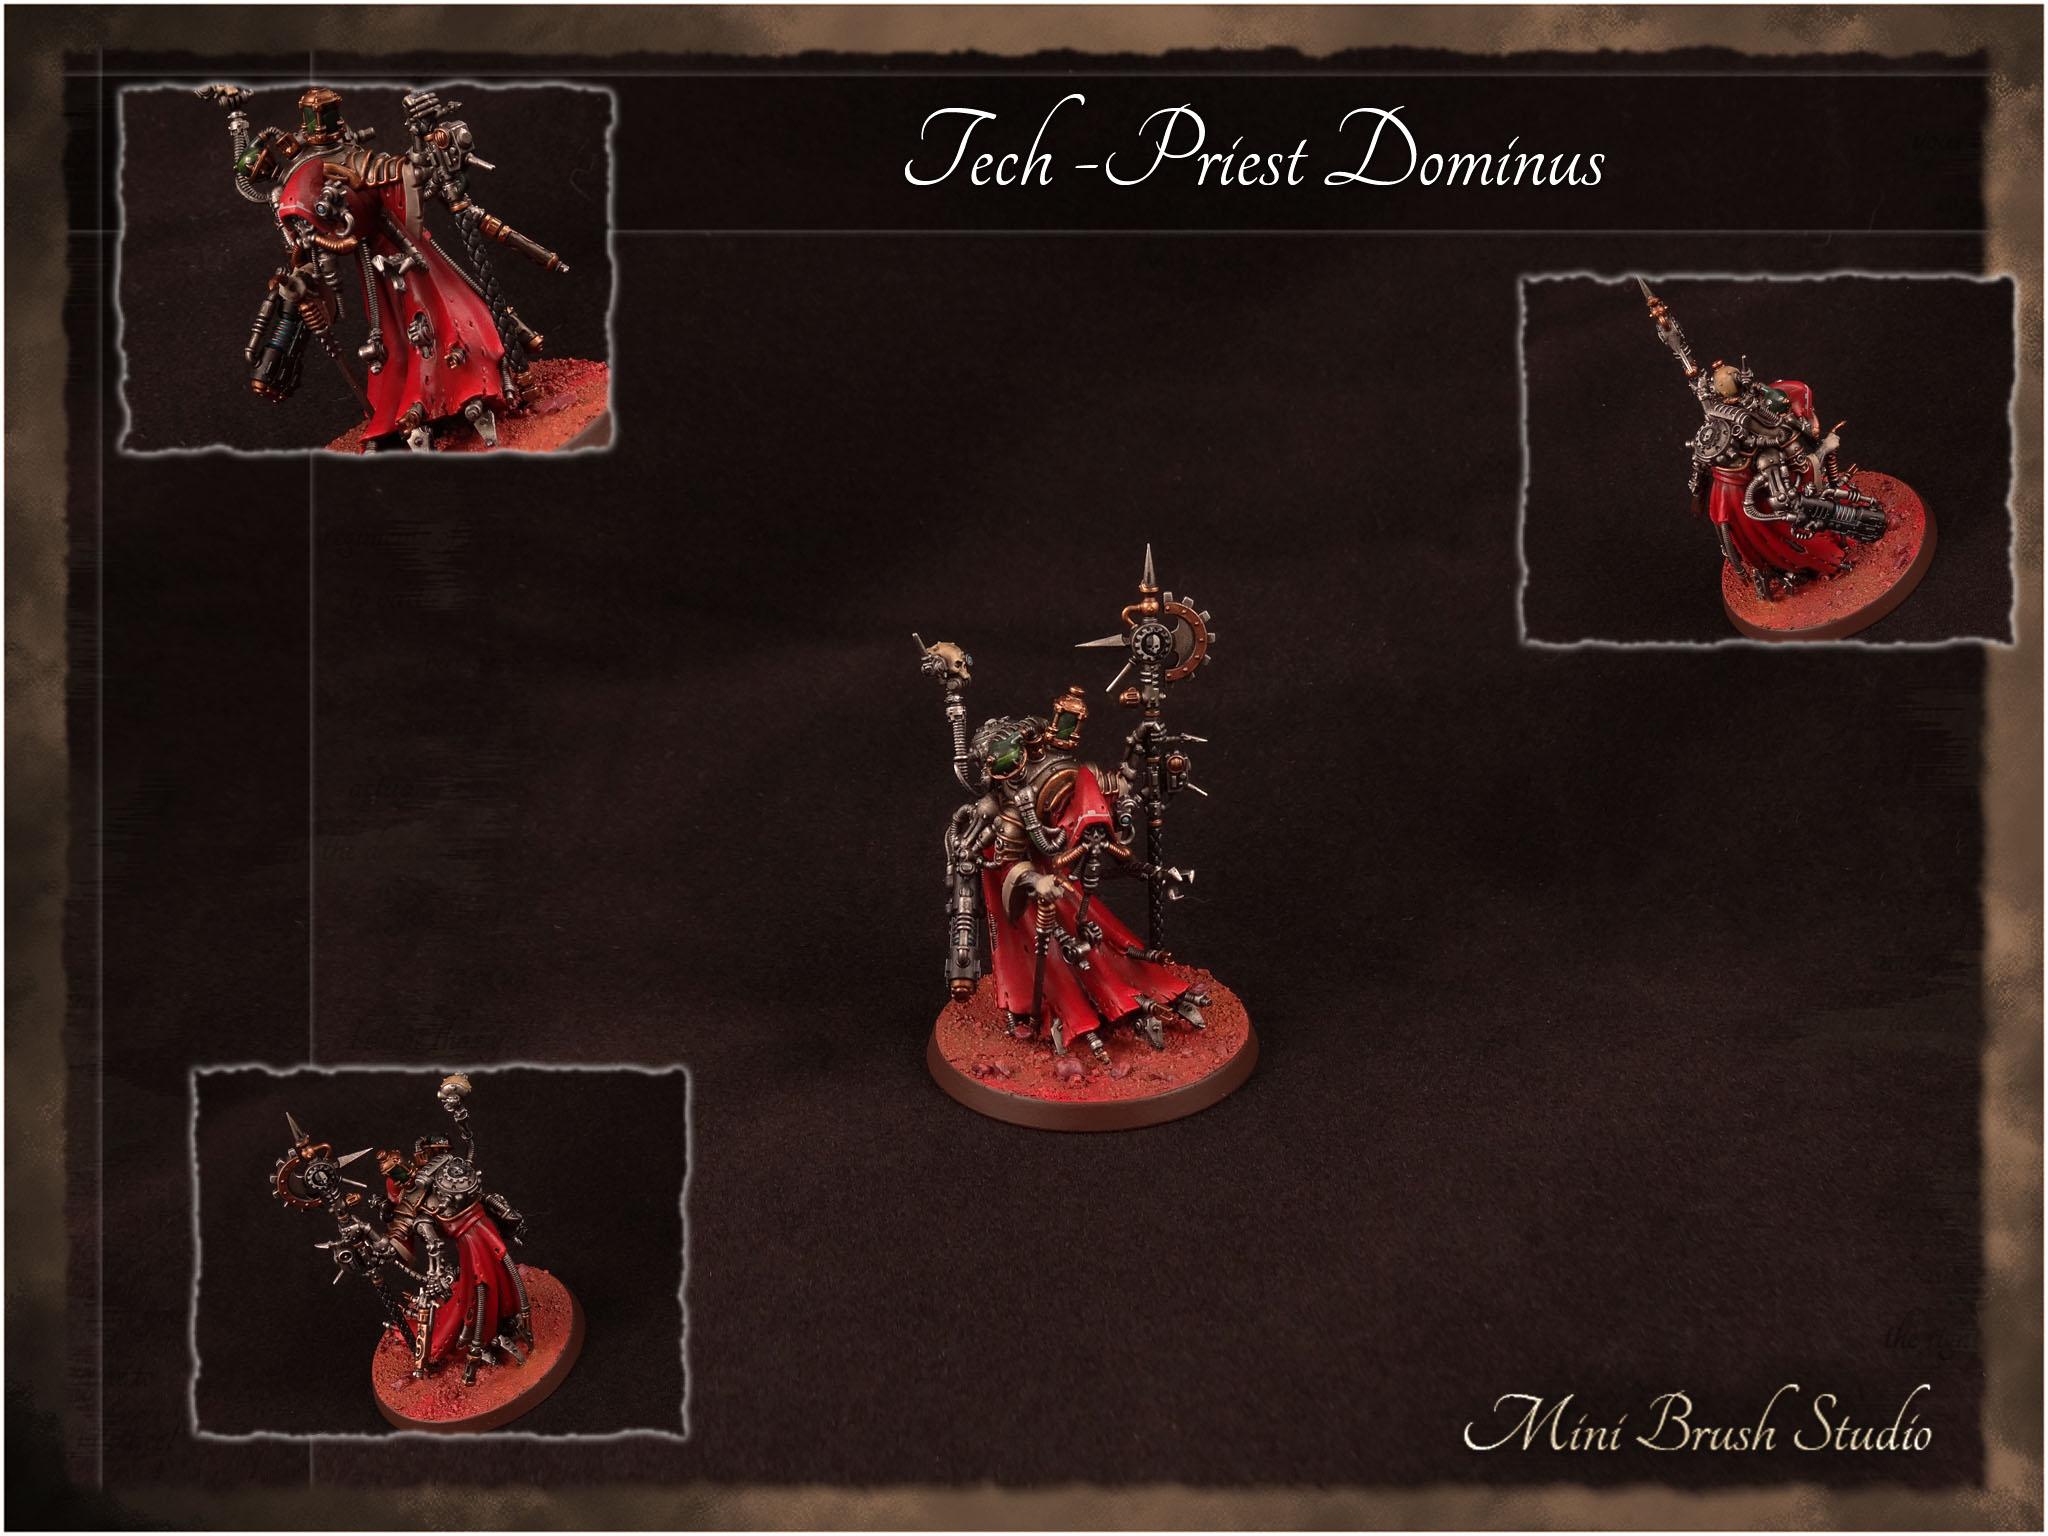 Tech -Priest Dominus 1 v7.jpg